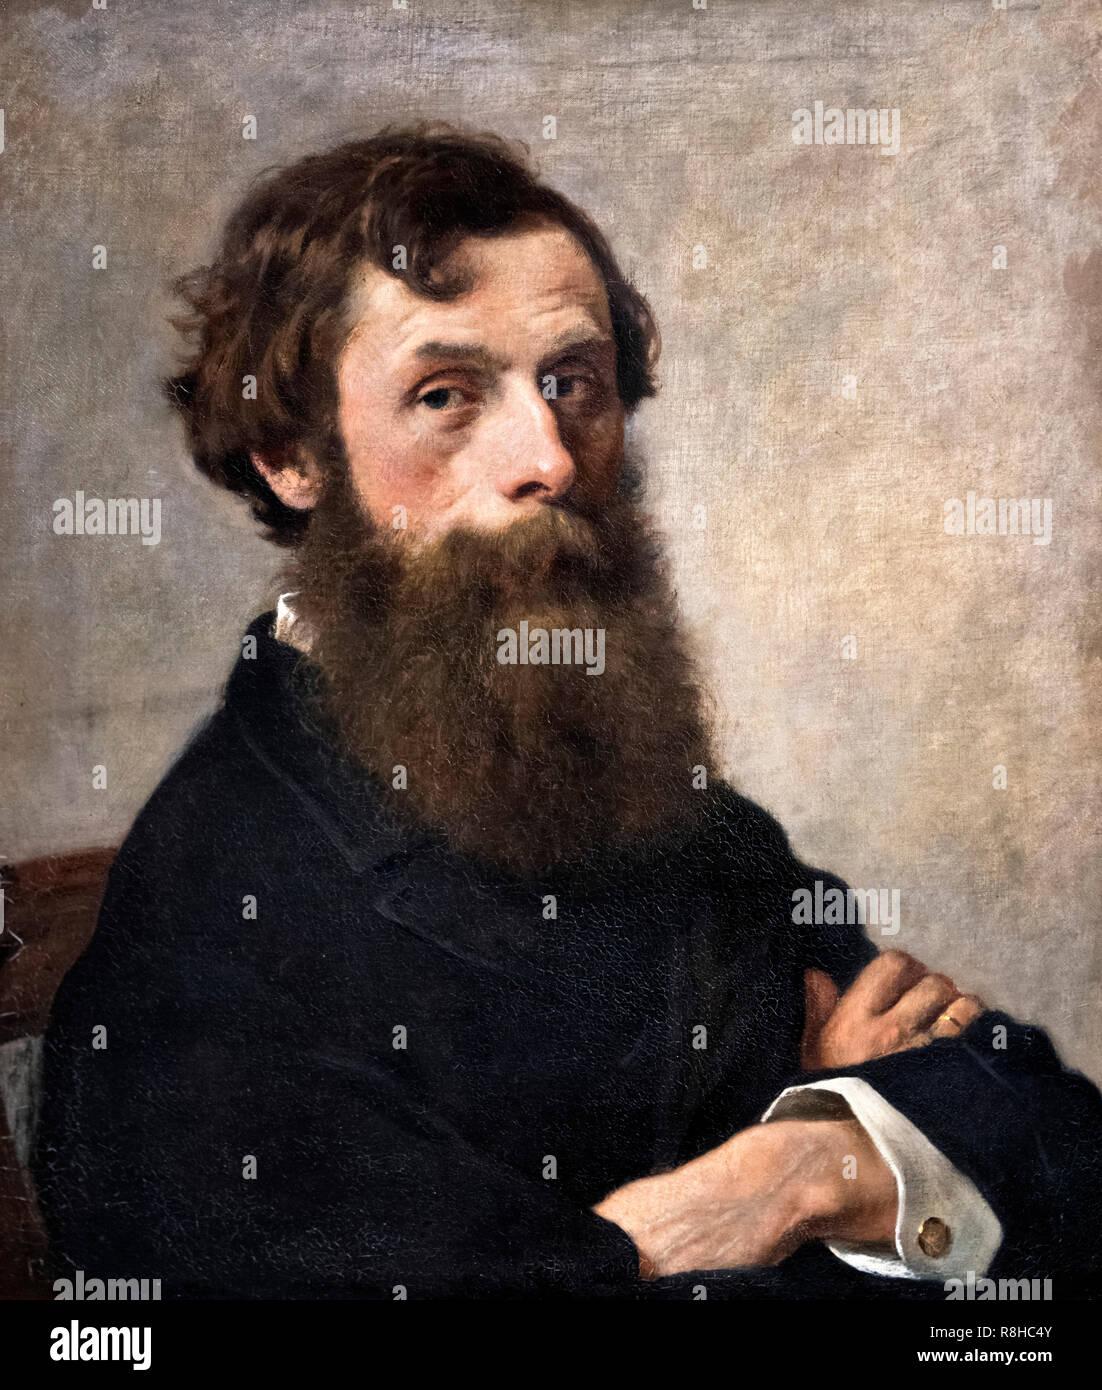 Oswald Adalbert Sickert (1828-1885) by Otto Scholderer (1834-1902), oil on canvas - Stock Image